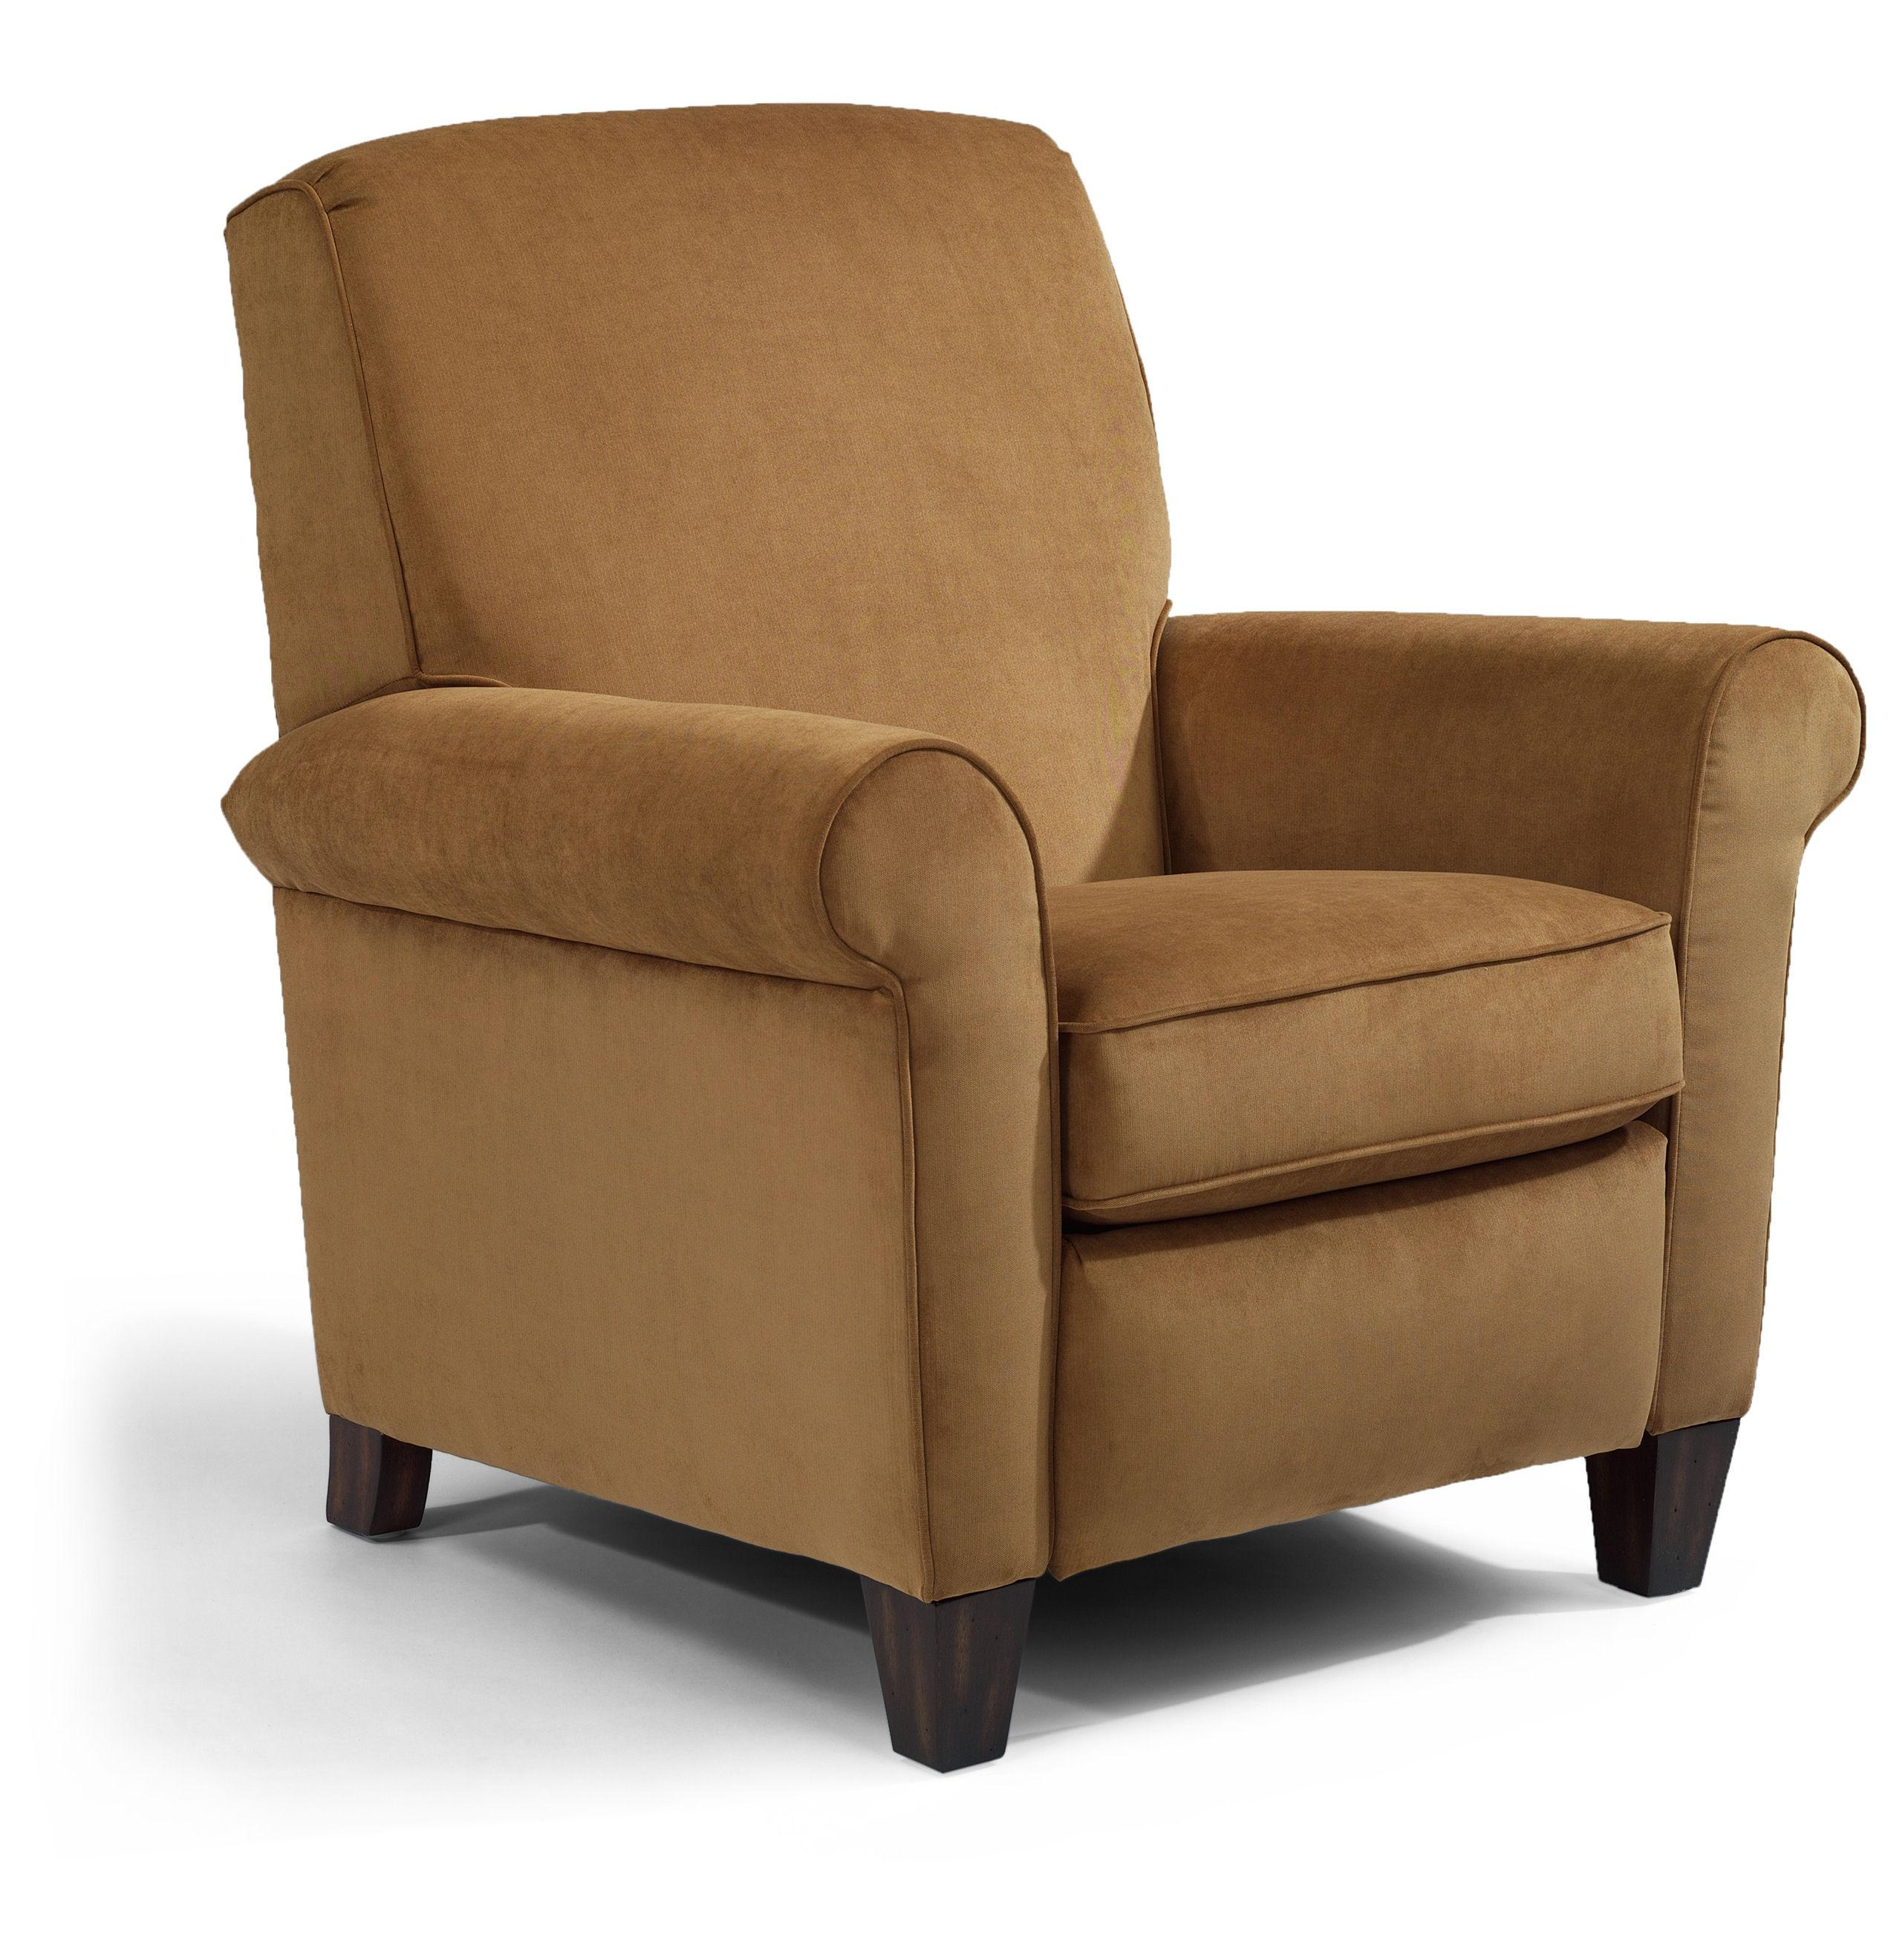 Flexsteel Dana Wall Recliner Olinde S Furniture Three